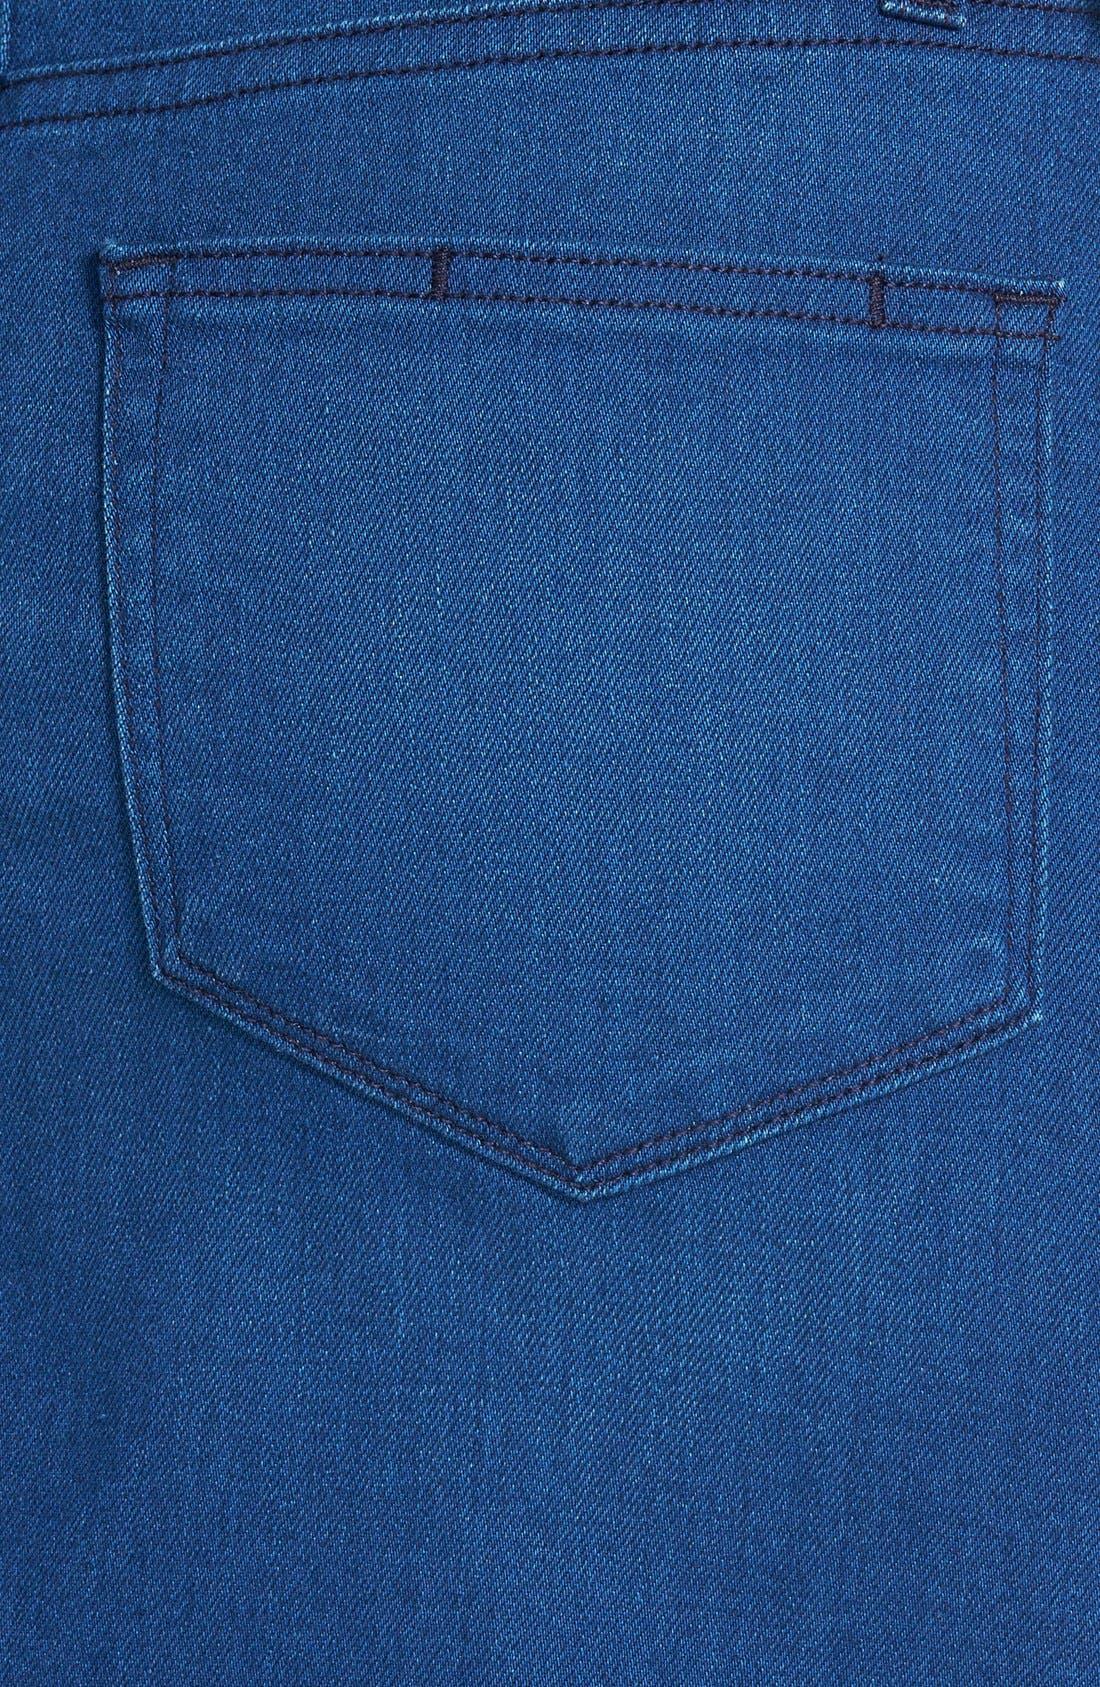 Alternate Image 3  - Paige Denim 'Deirdre' Denim Pencil Skirt (Frenchie No Whiskers)